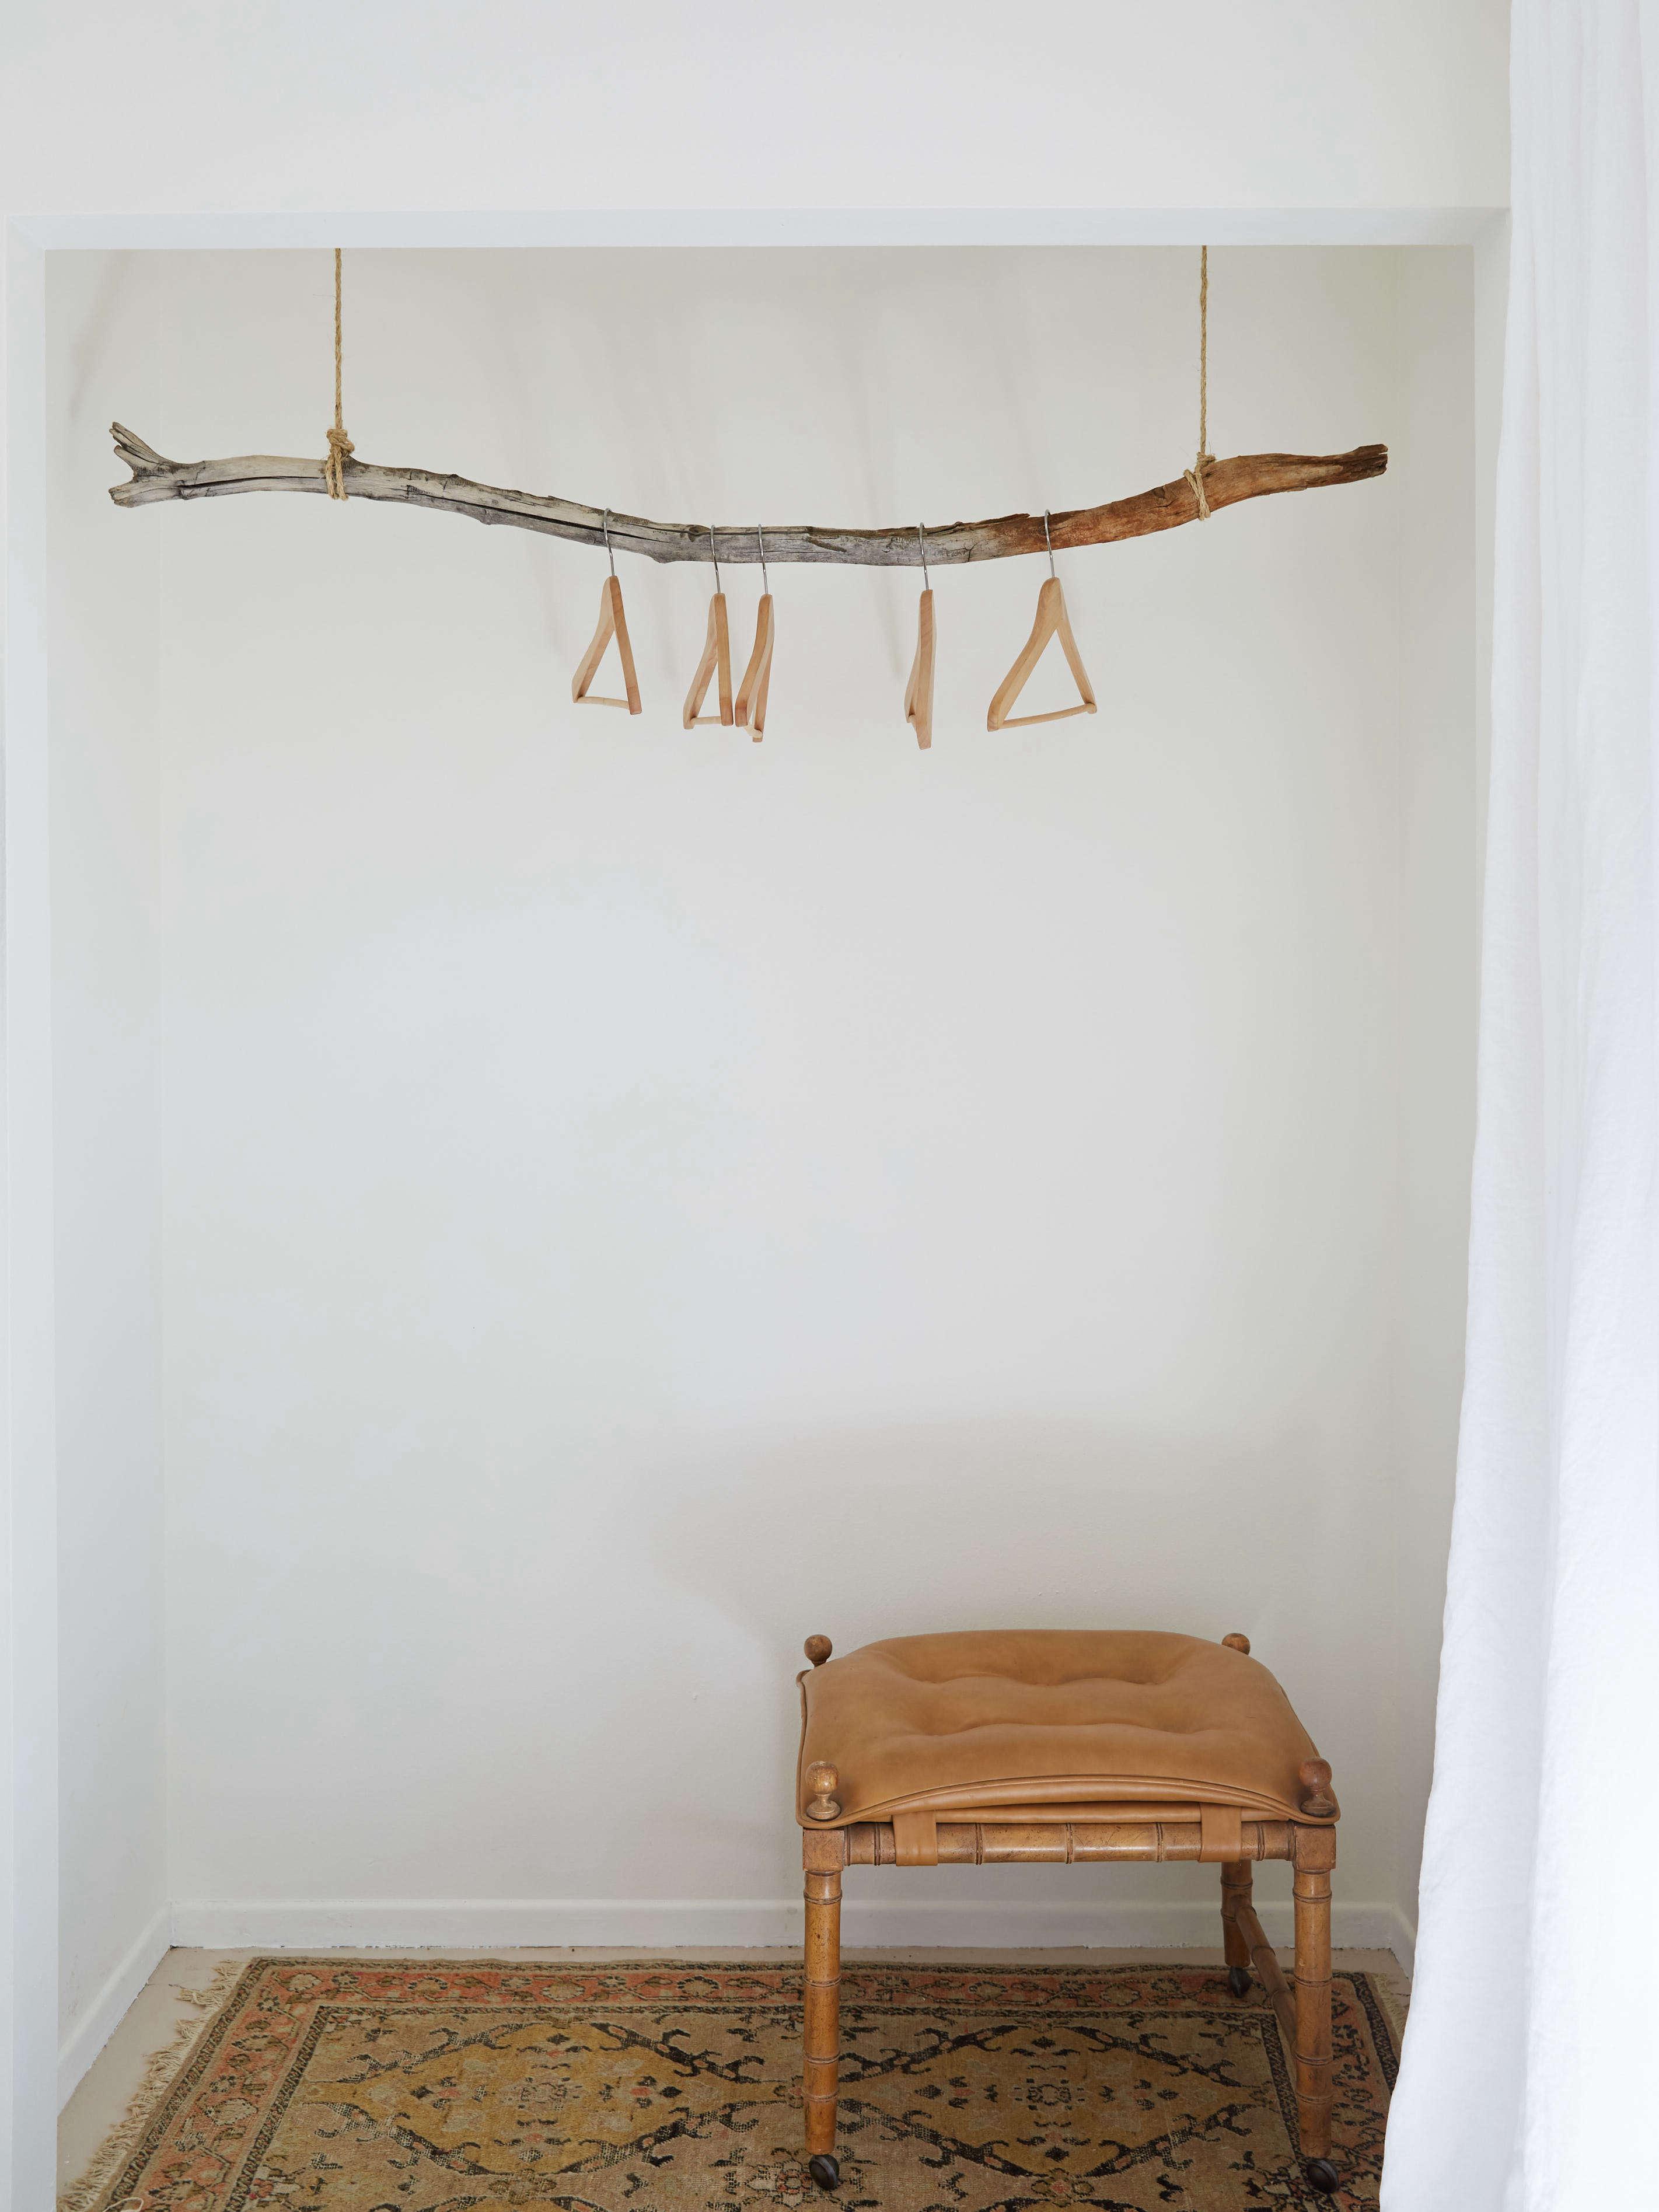 DIY closet made from a hanging branch at the Joshua Tree Casita Air Bnb, Kate Sears photo